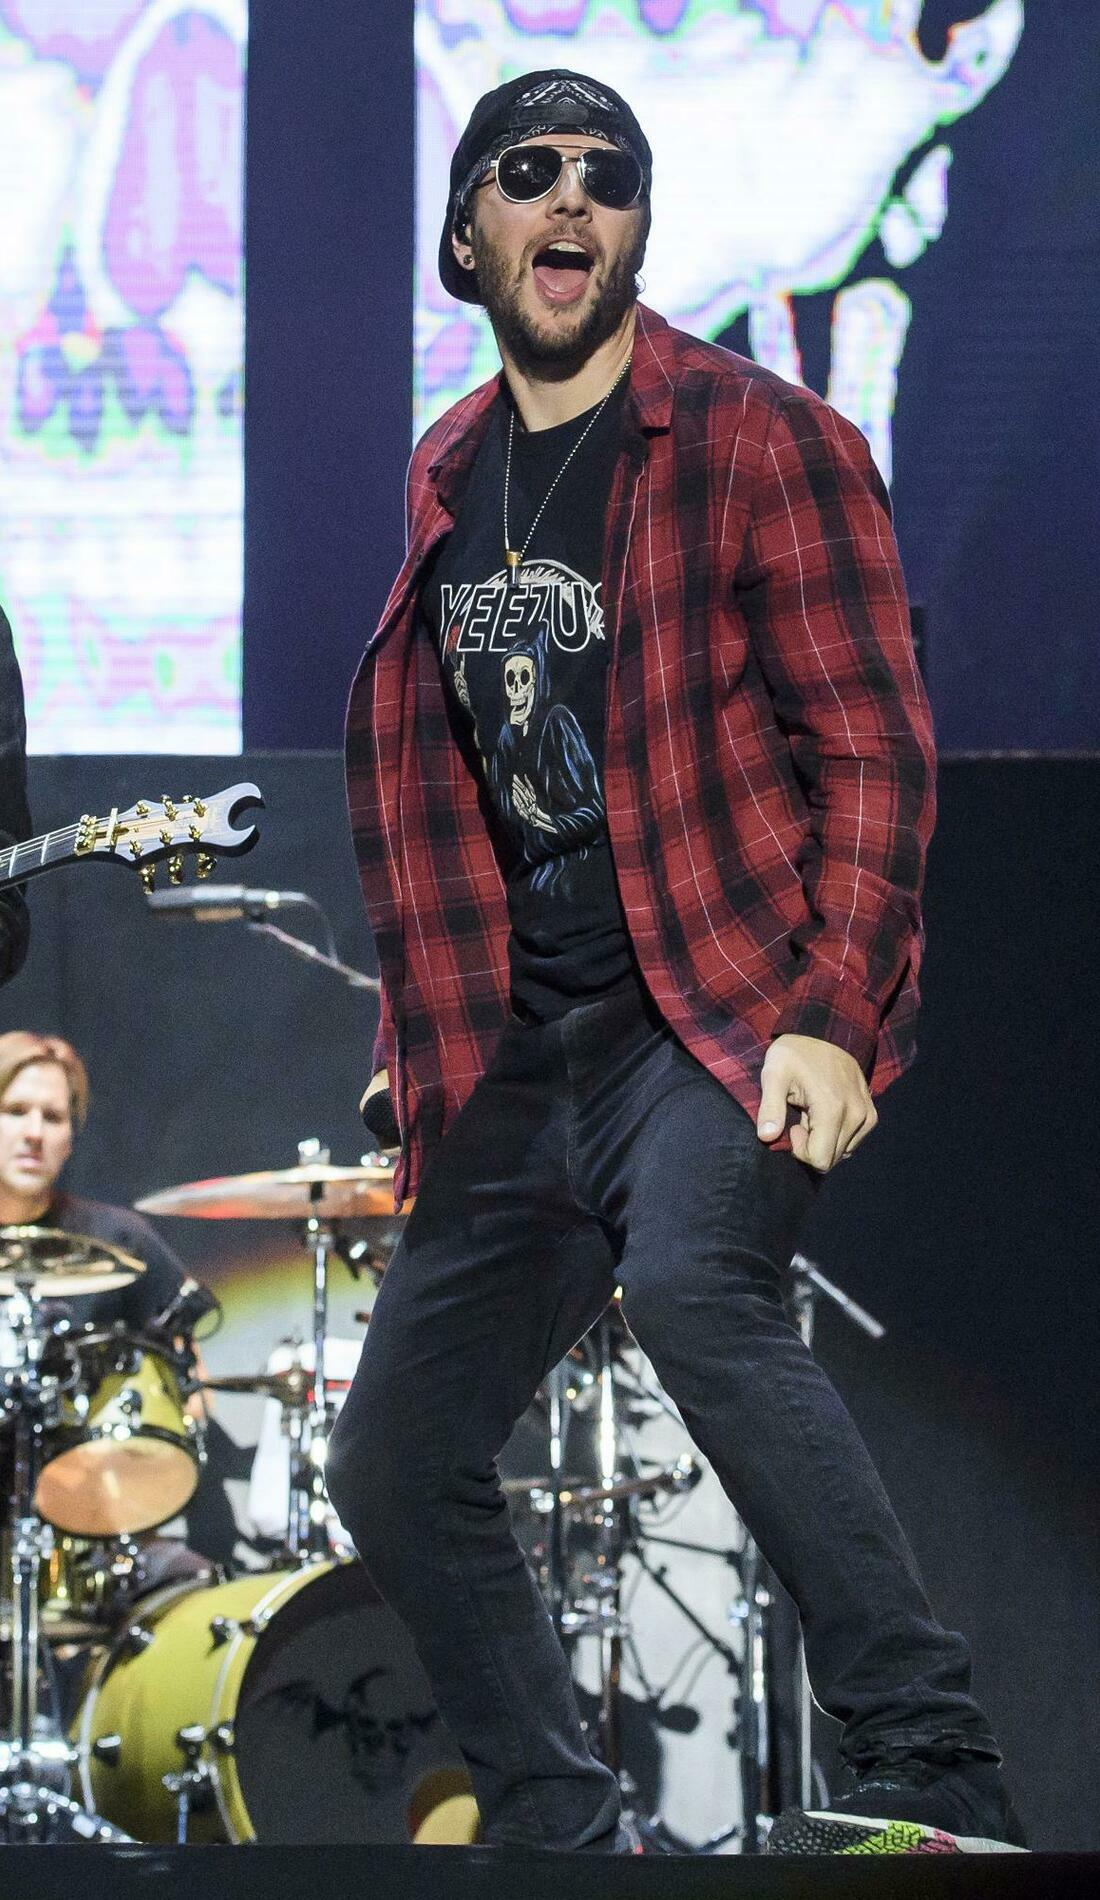 A Avenged Sevenfold live event